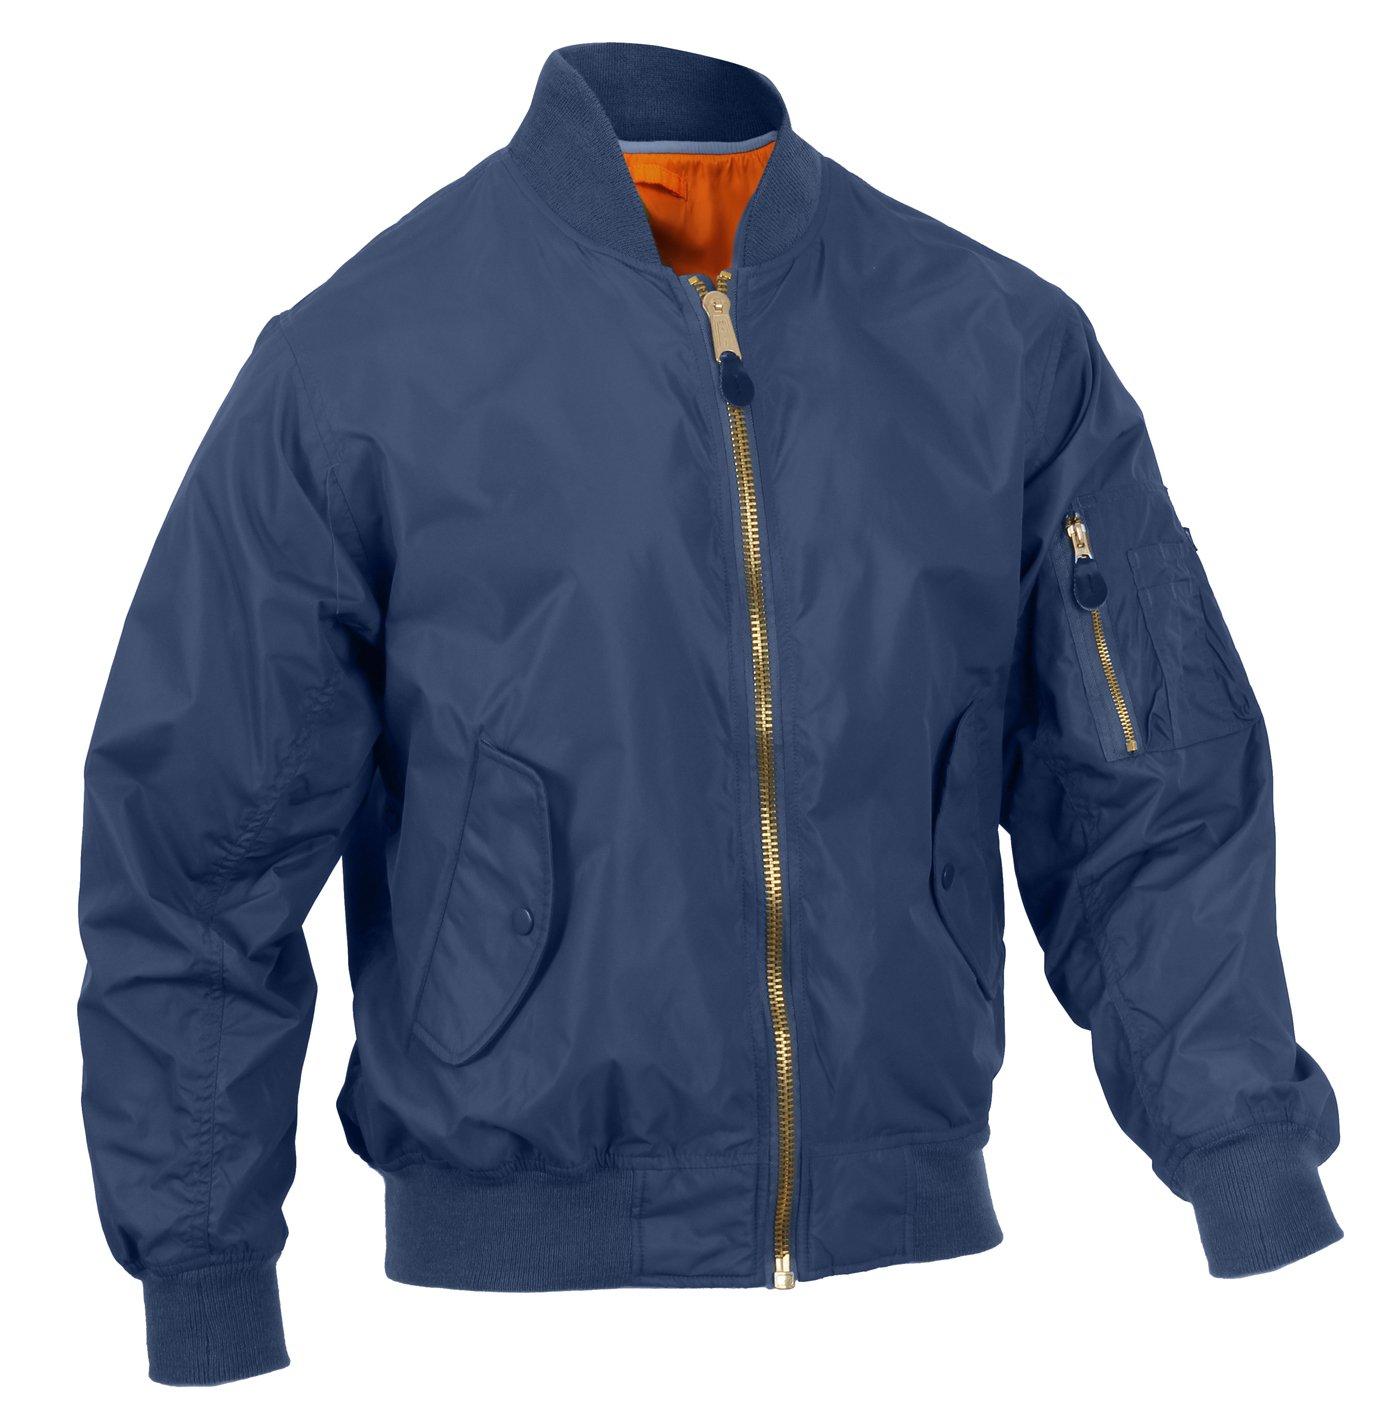 Rothco Lightweight MA-1 Flight Jacket, Navy Blue, L